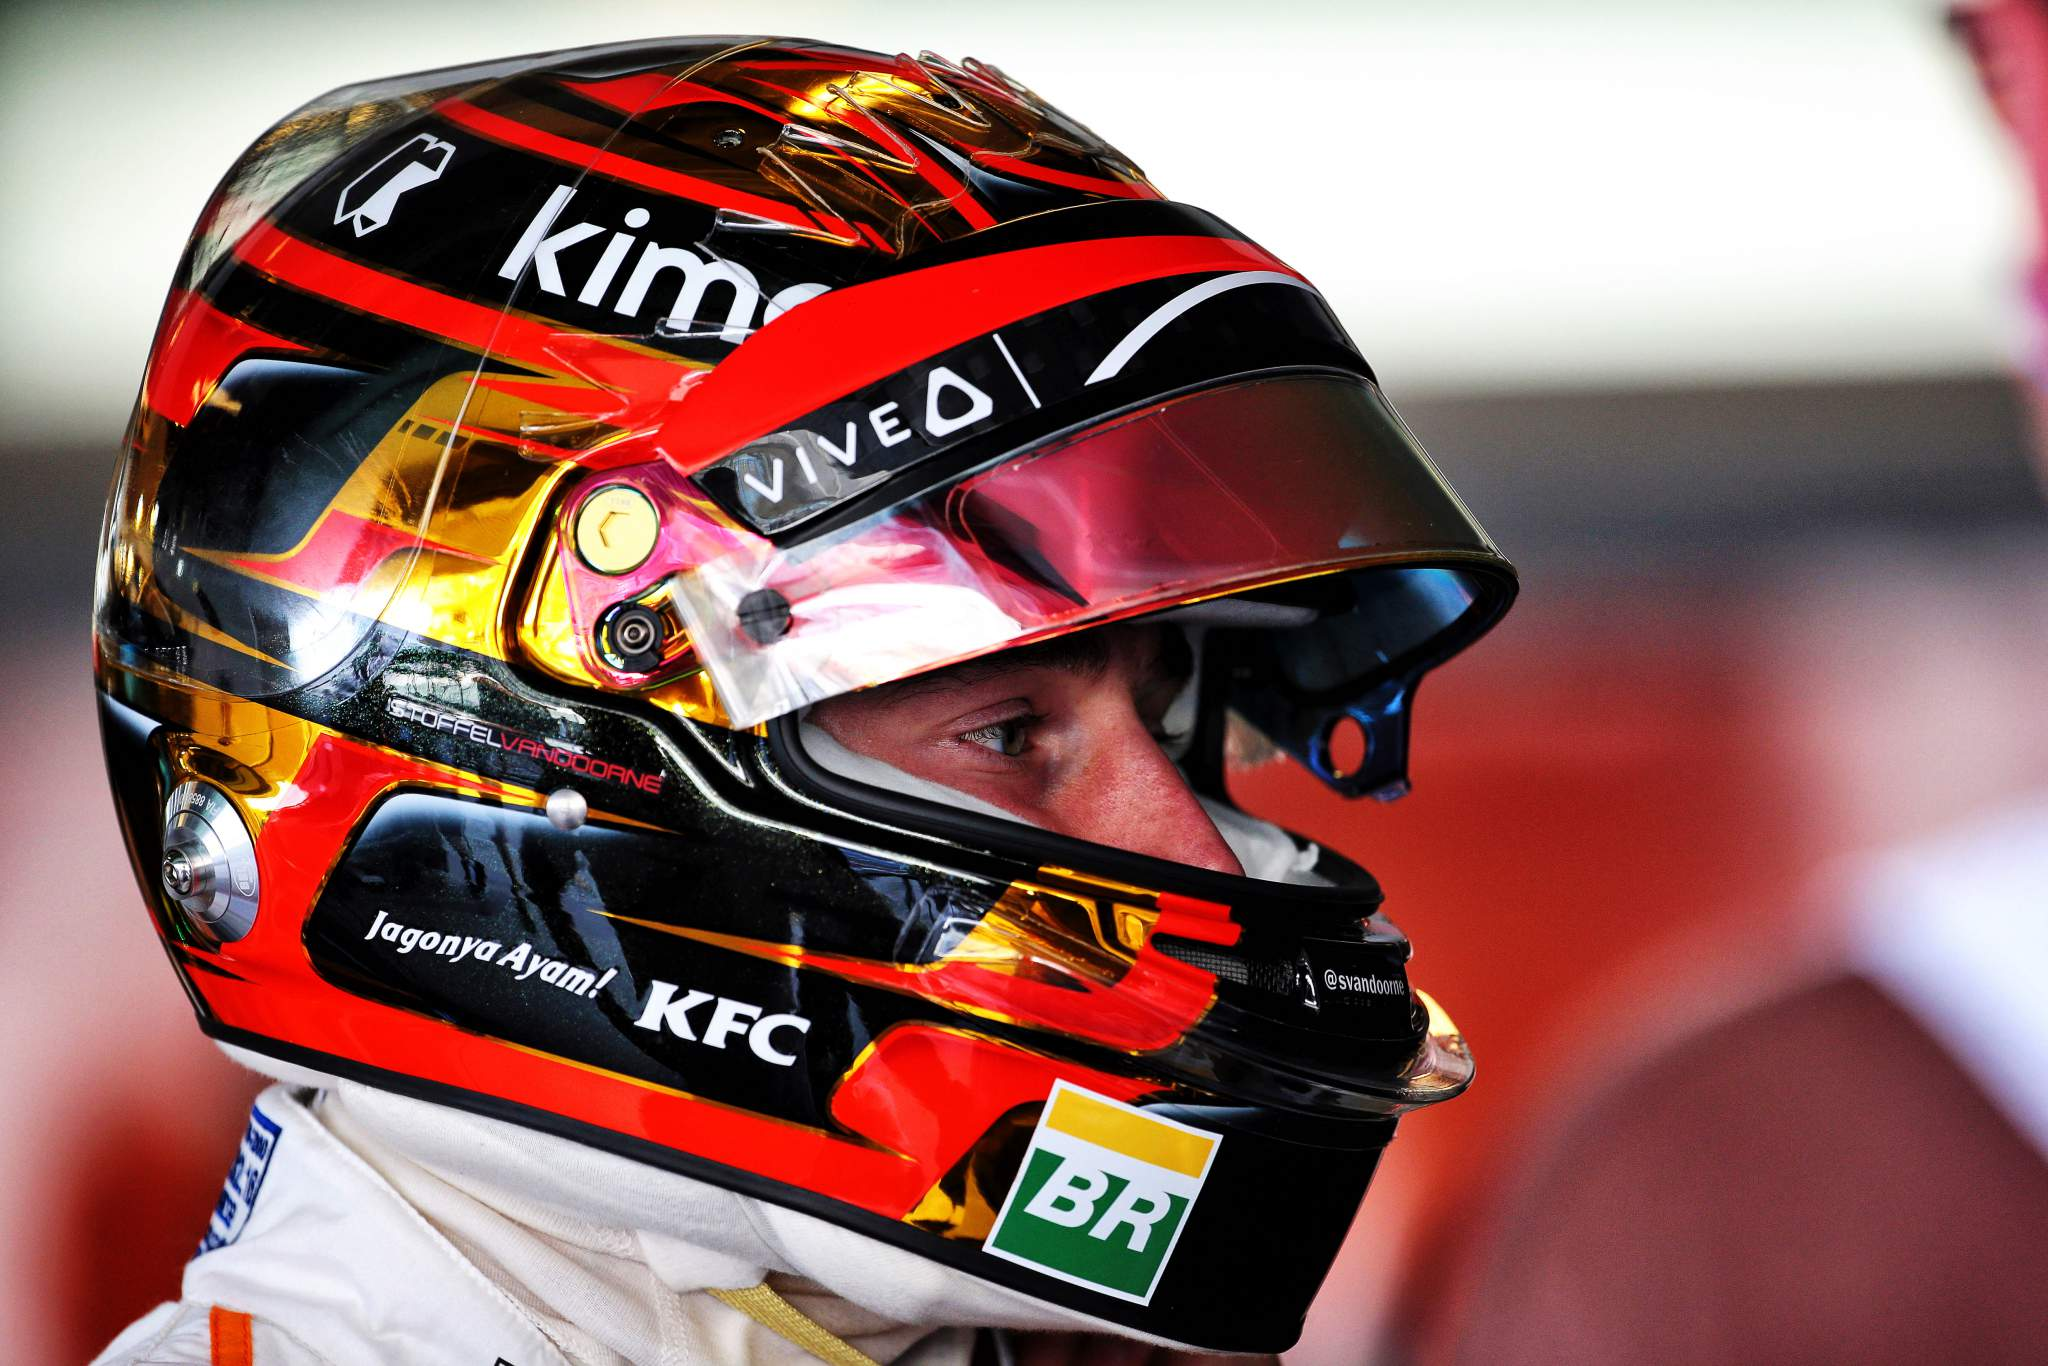 Motor Racing Formula One World Championship Abu Dhabi Grand Prix Qualifying Day Abu Dhabi, Uae